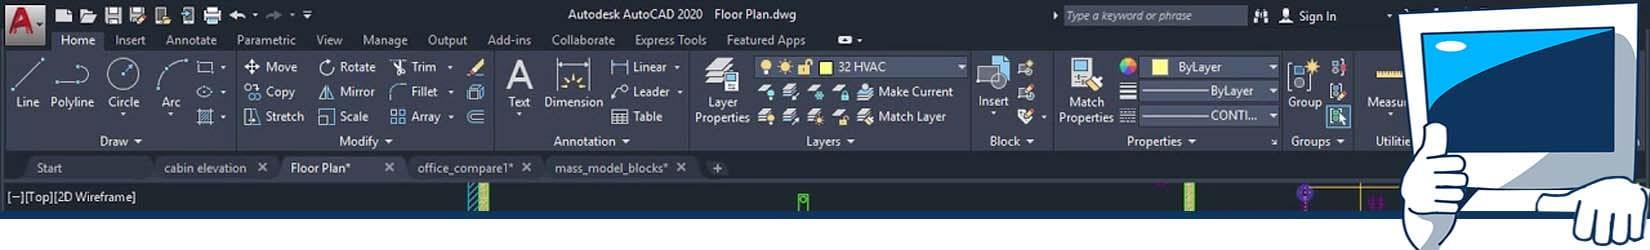 tipos de software de aplicacion